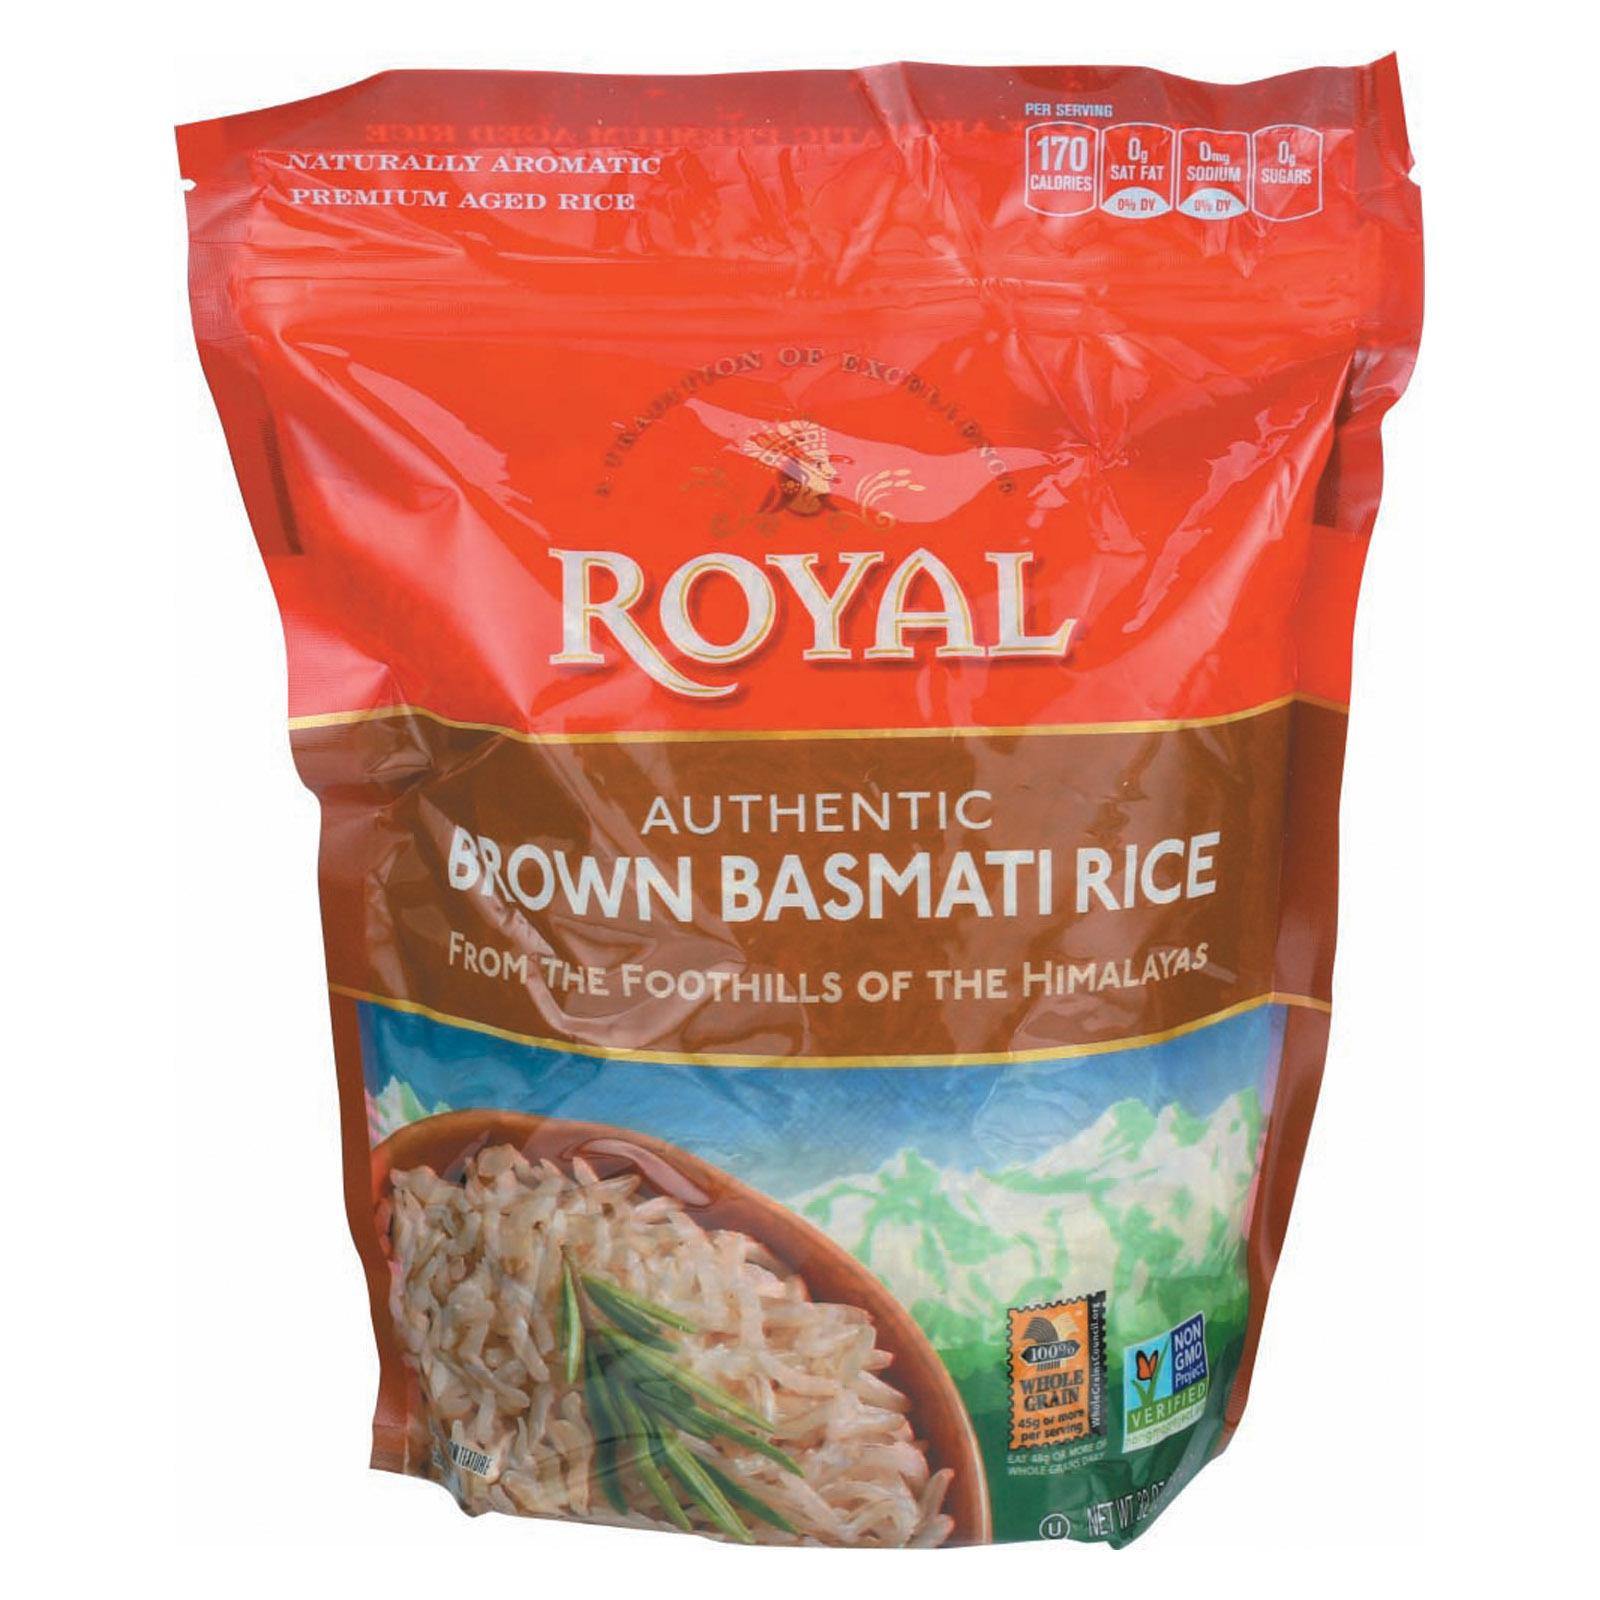 Royal Crest Lifestyle Rice - Basmati - Brown - Case of 6 - 32 oz